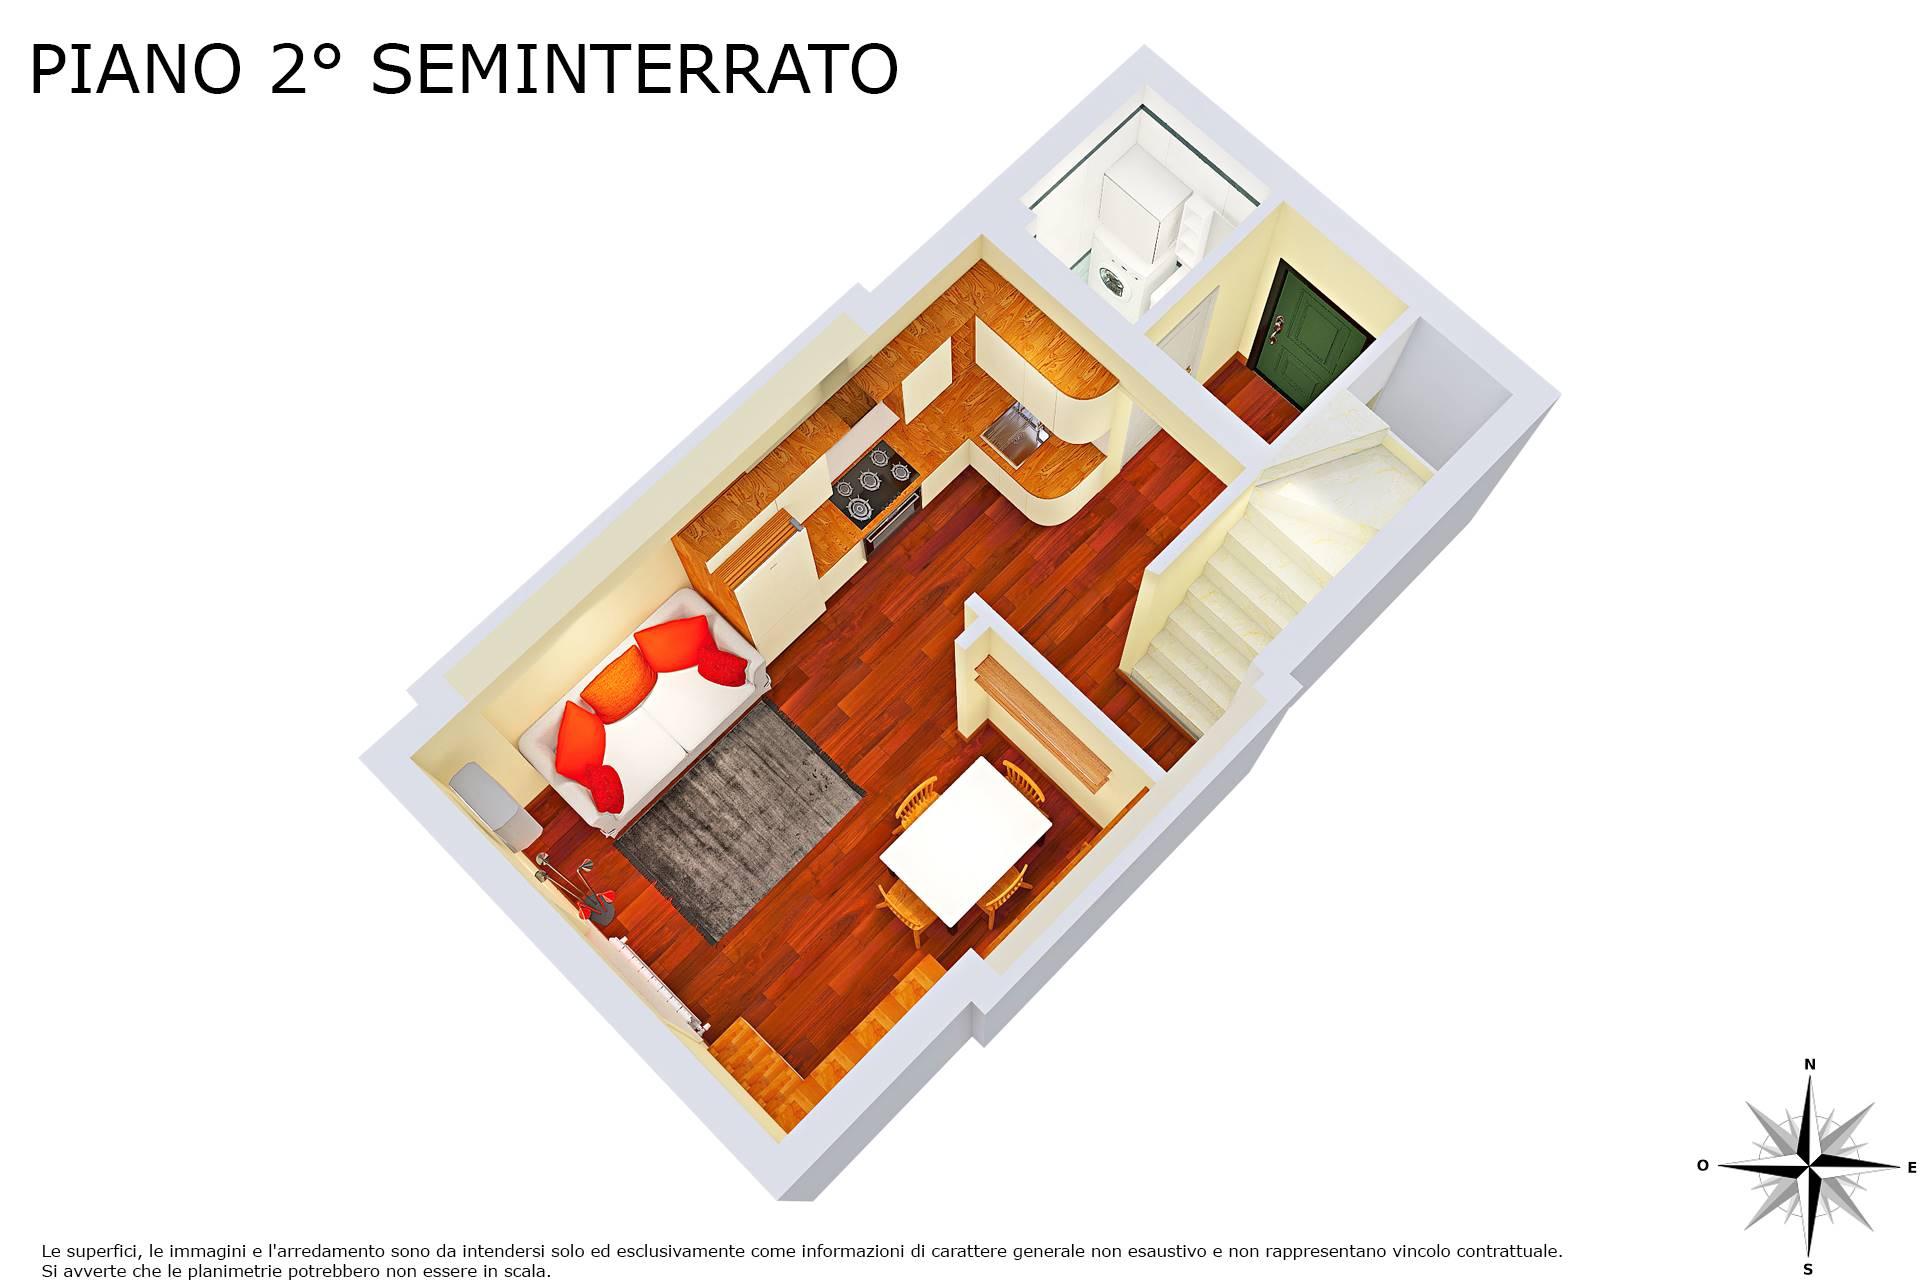 Planimetria 3D piano 2° seminterrato